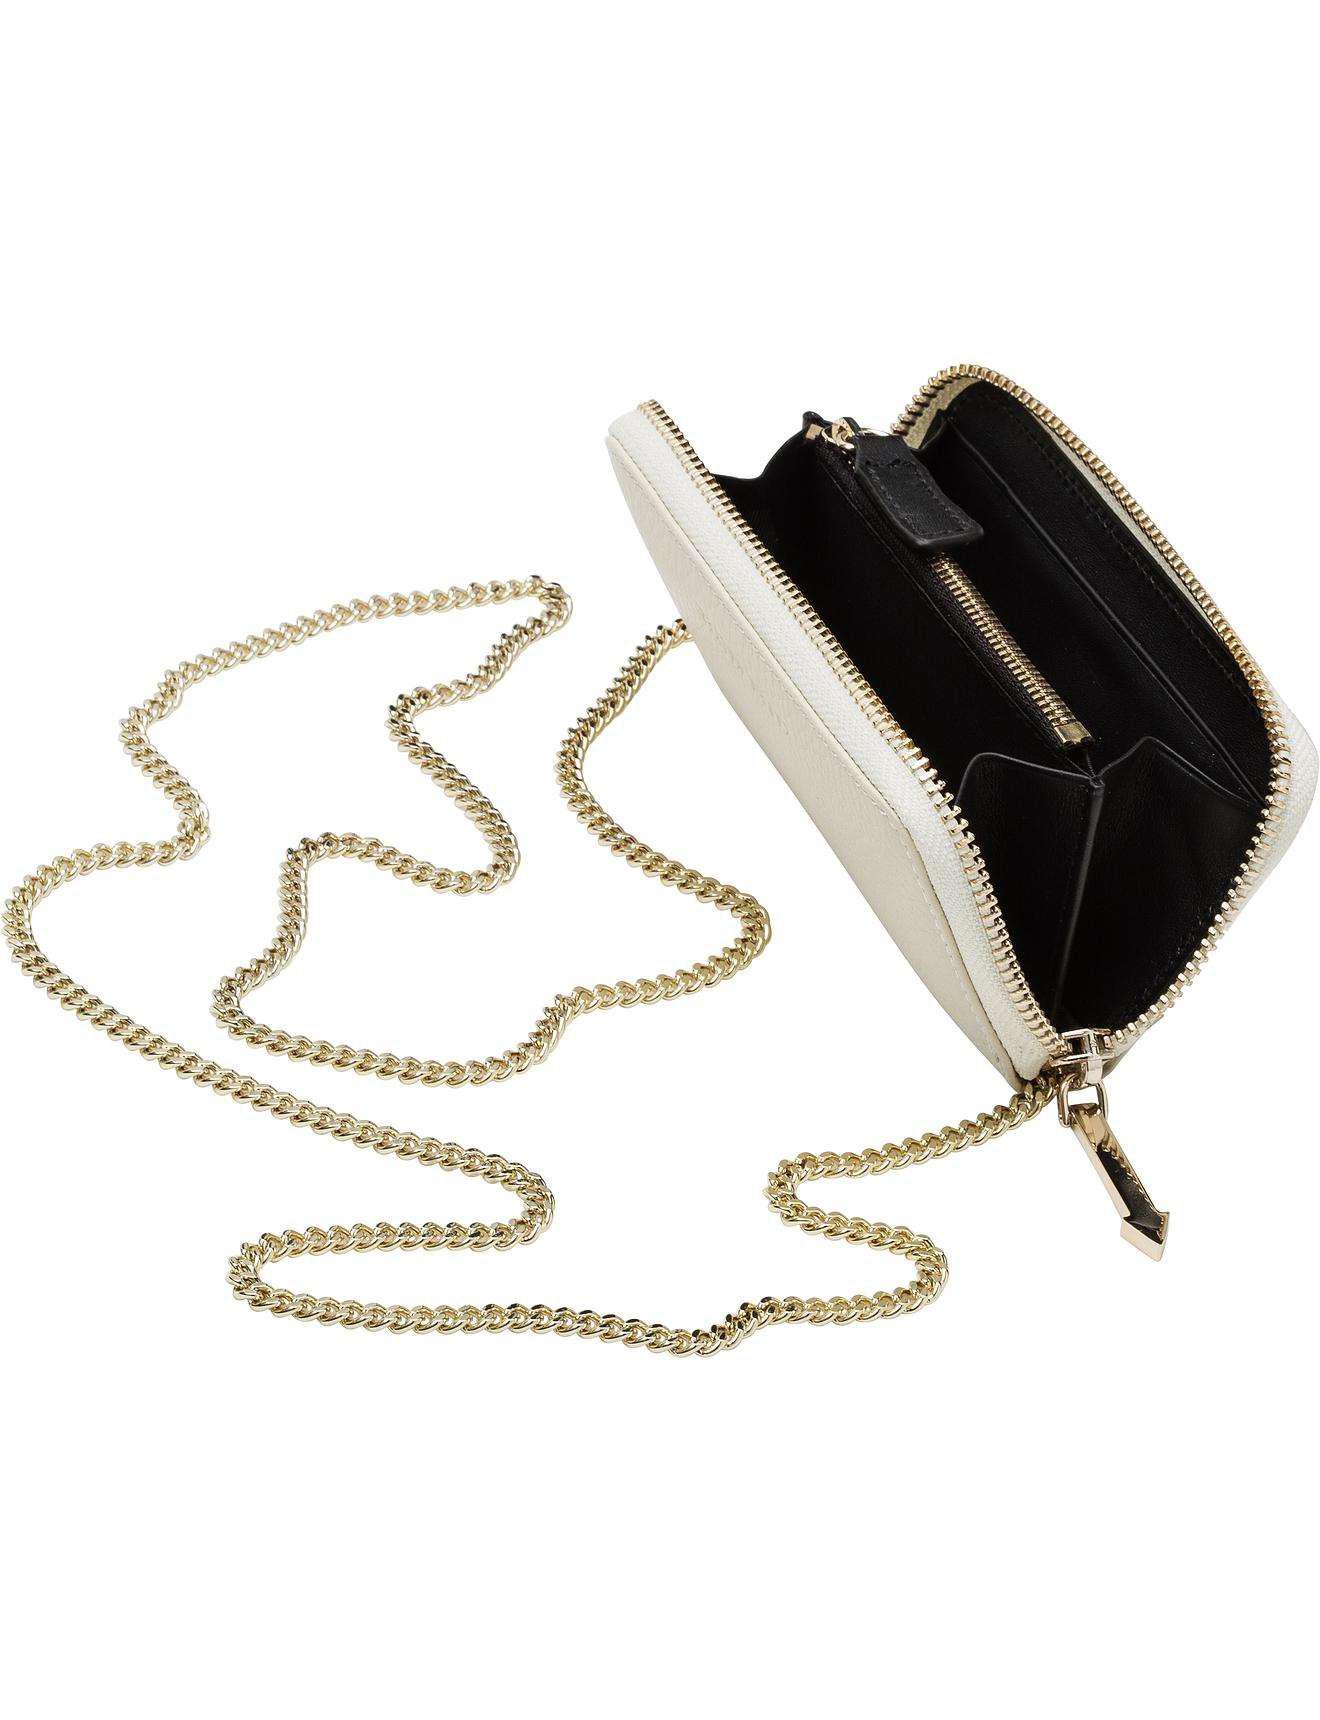 70383608e76 Karen Walker Cara Coin Purse-chain Strap in Natural - Lyst